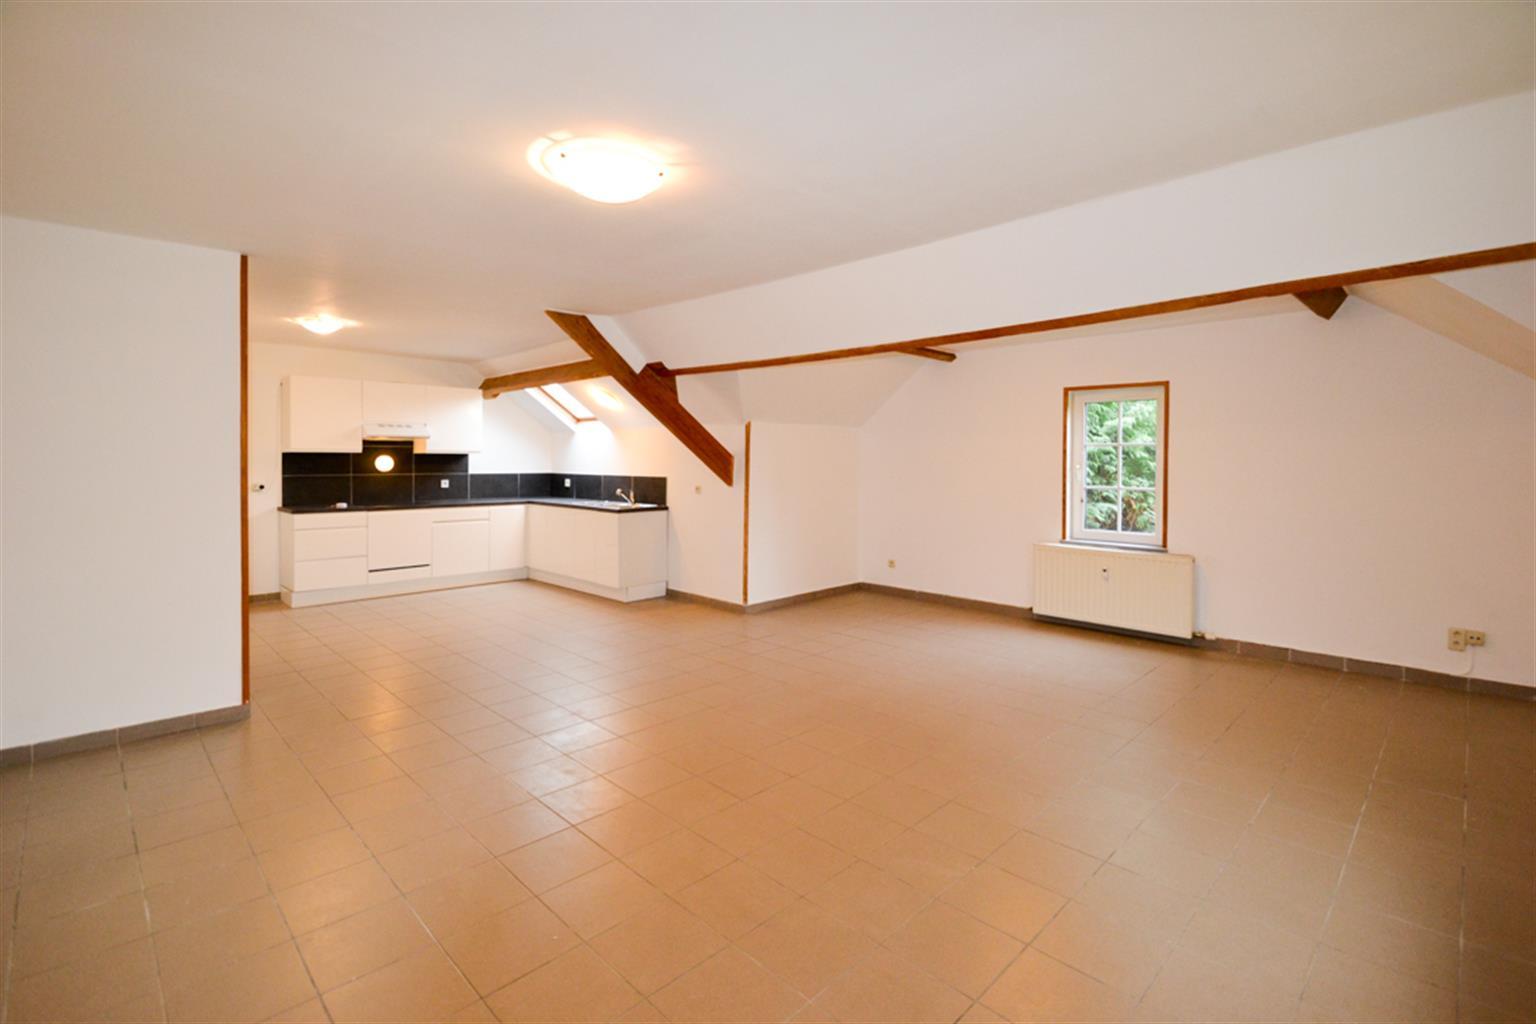 Appartement - Leval-Trahegnies - #3703787-0